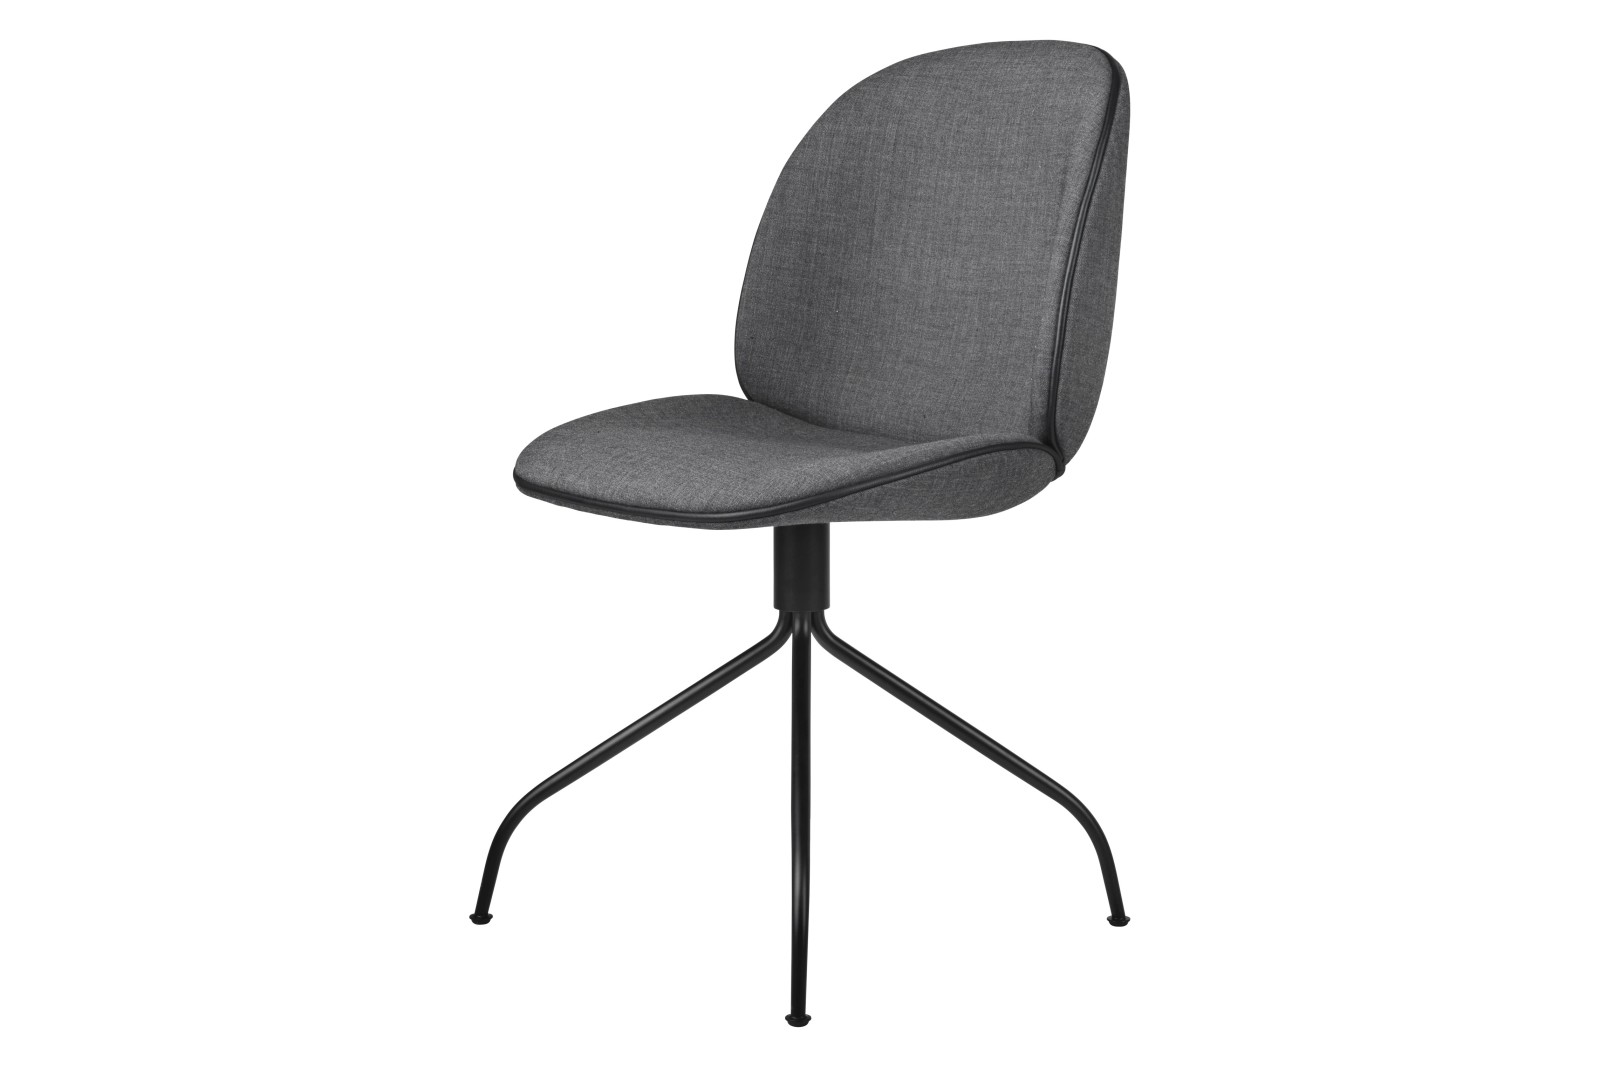 Beetle Meeting Chair - Fully Upholstered, Swivel base Gubi Metal Black Matt, Price Grp. 02